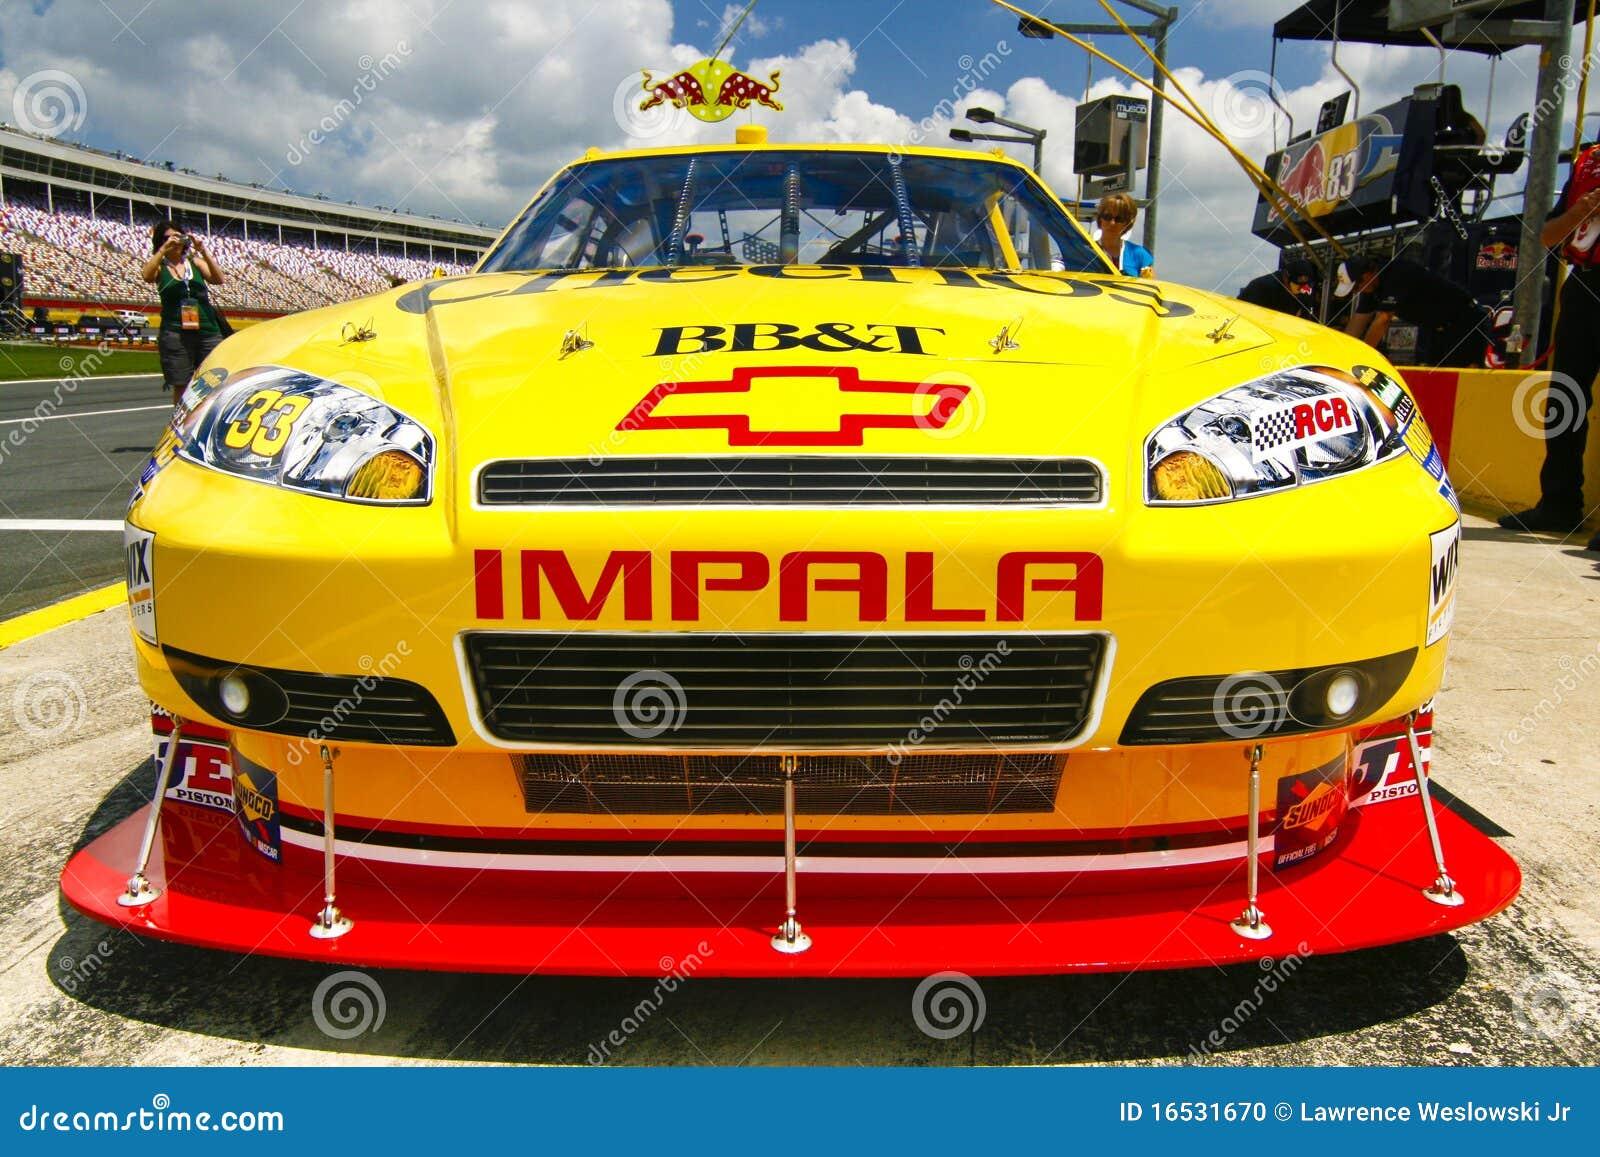 NASCAR - Cheerios BB&T Sponsorship